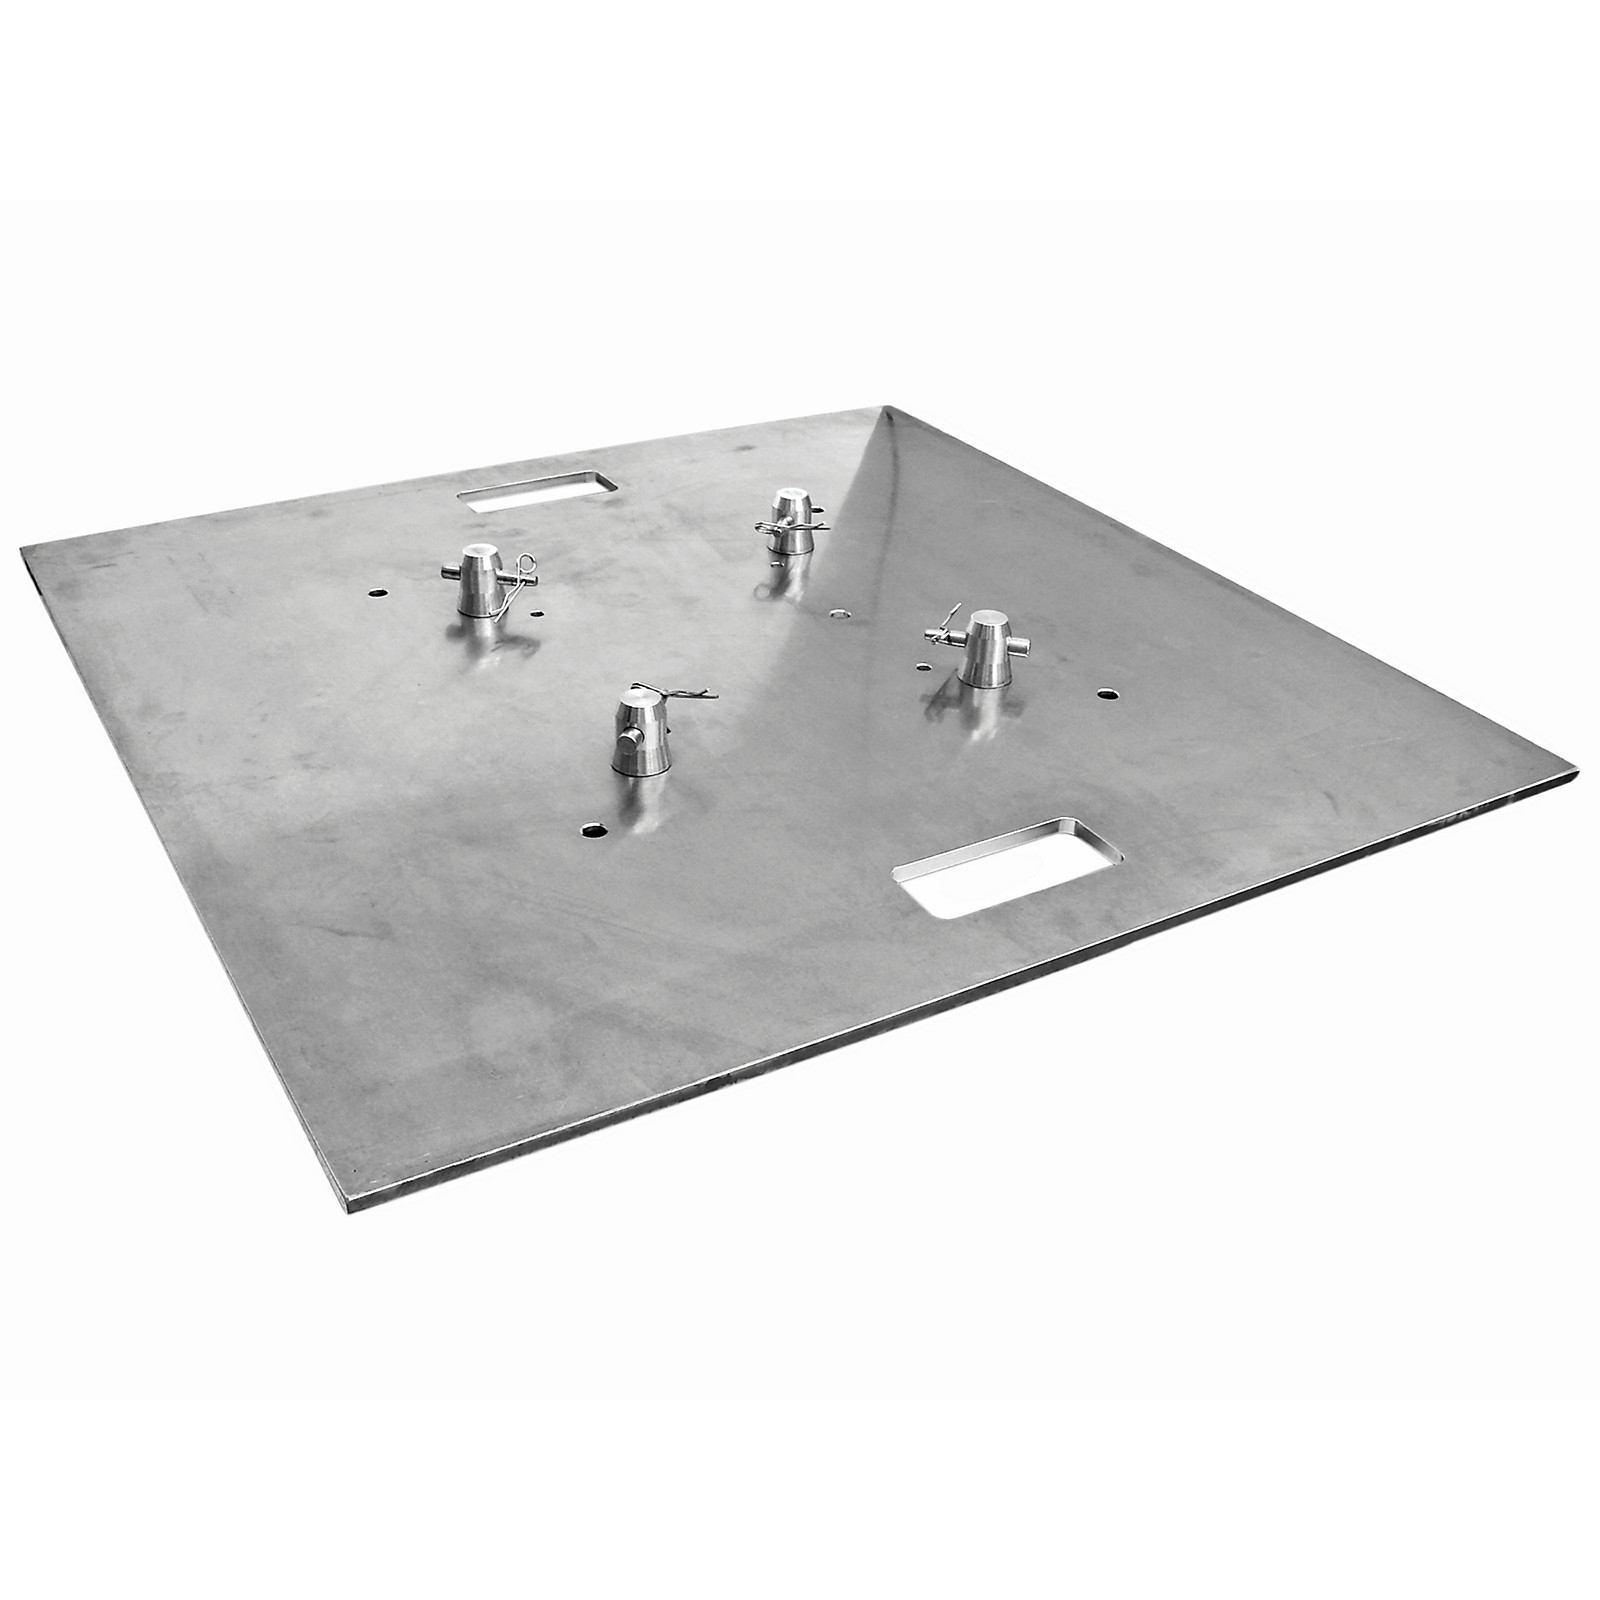 GLOBAL TRUSS BASEPLATE30X30A 30 x 30 In. Aluminum Base Plate